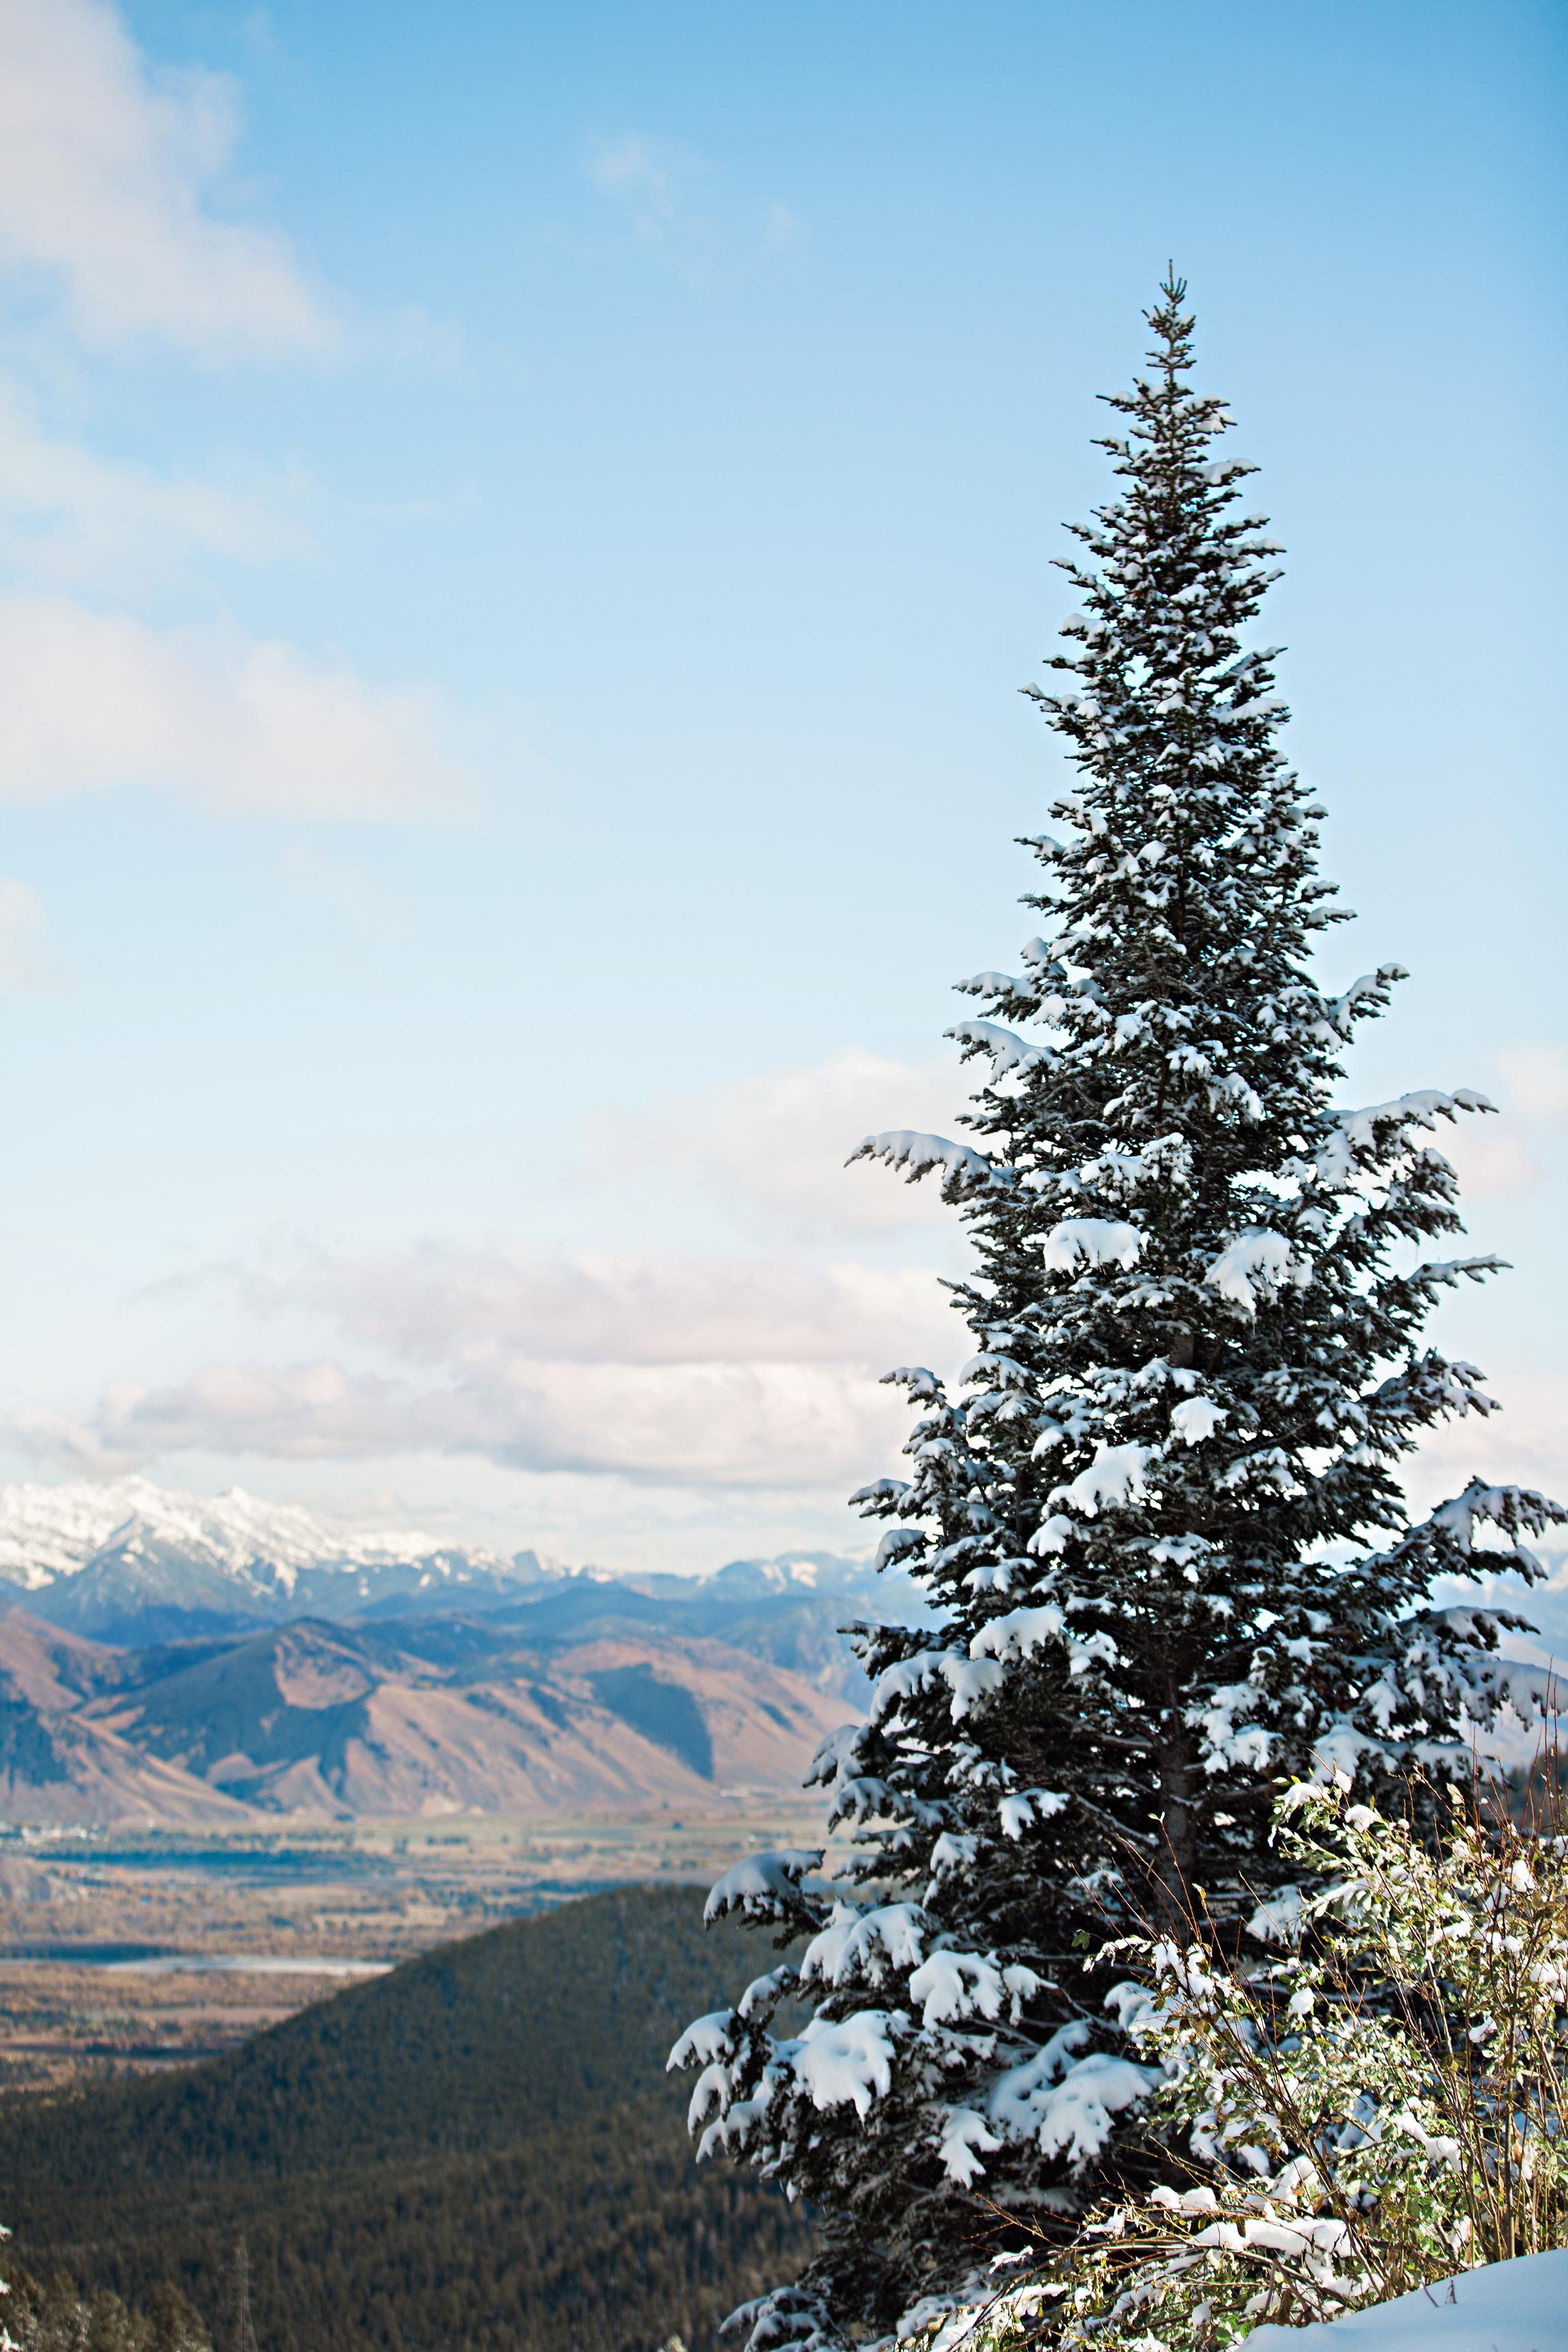 Cindy_Giovagnoli_Idaho_Wyoming_Grand_Teton_National_Park_autumn_aspens_camping_mountains-015.jpg